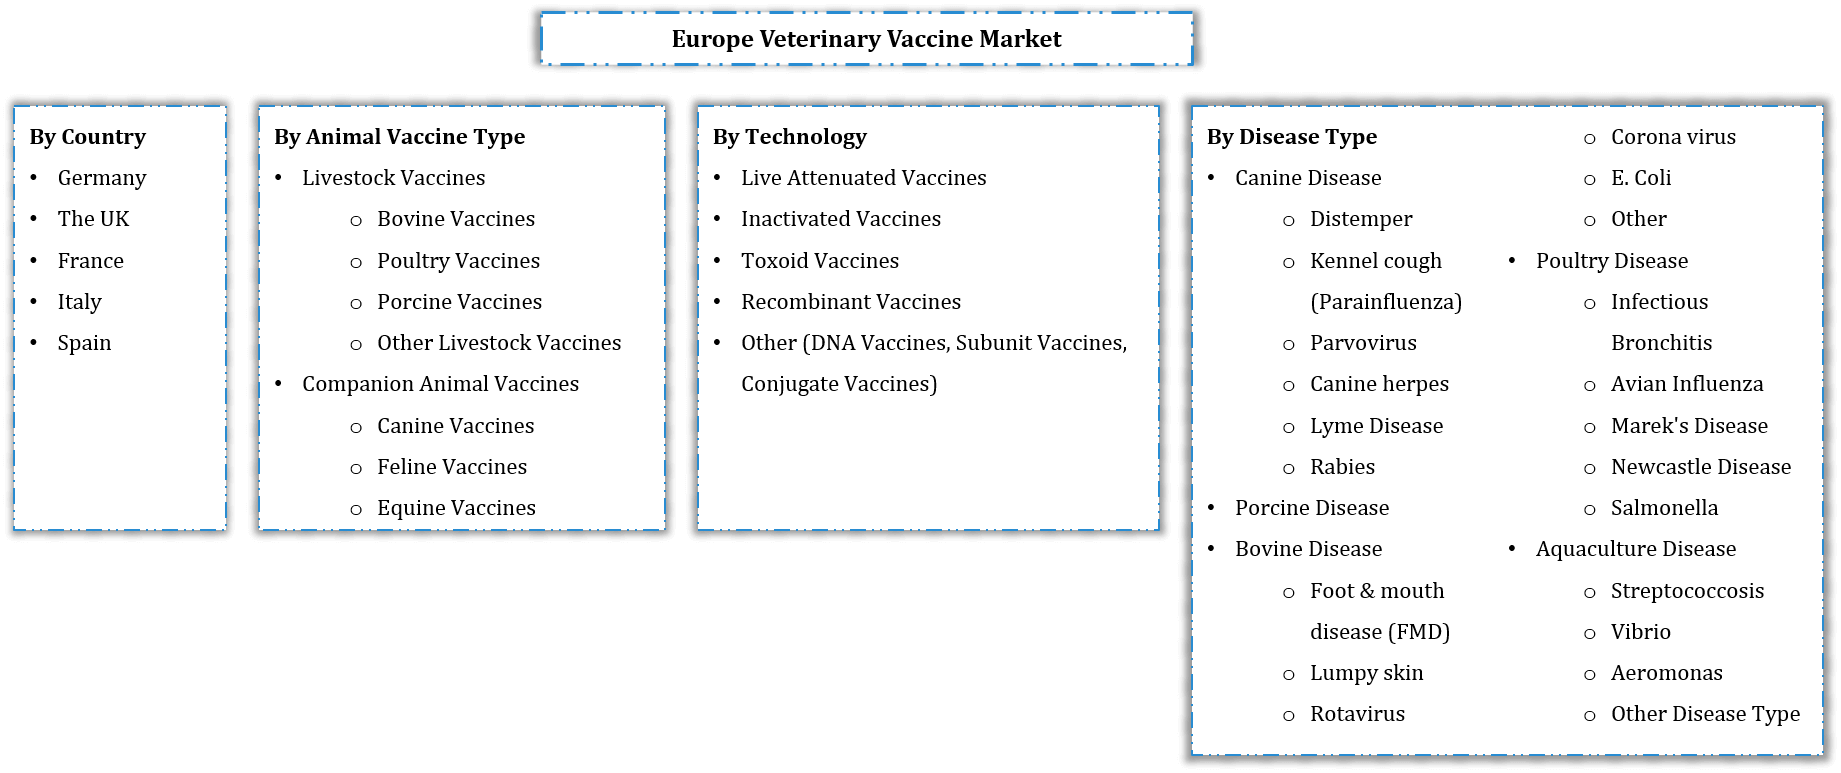 Europe Veterinary Vaccine Market Segmentation